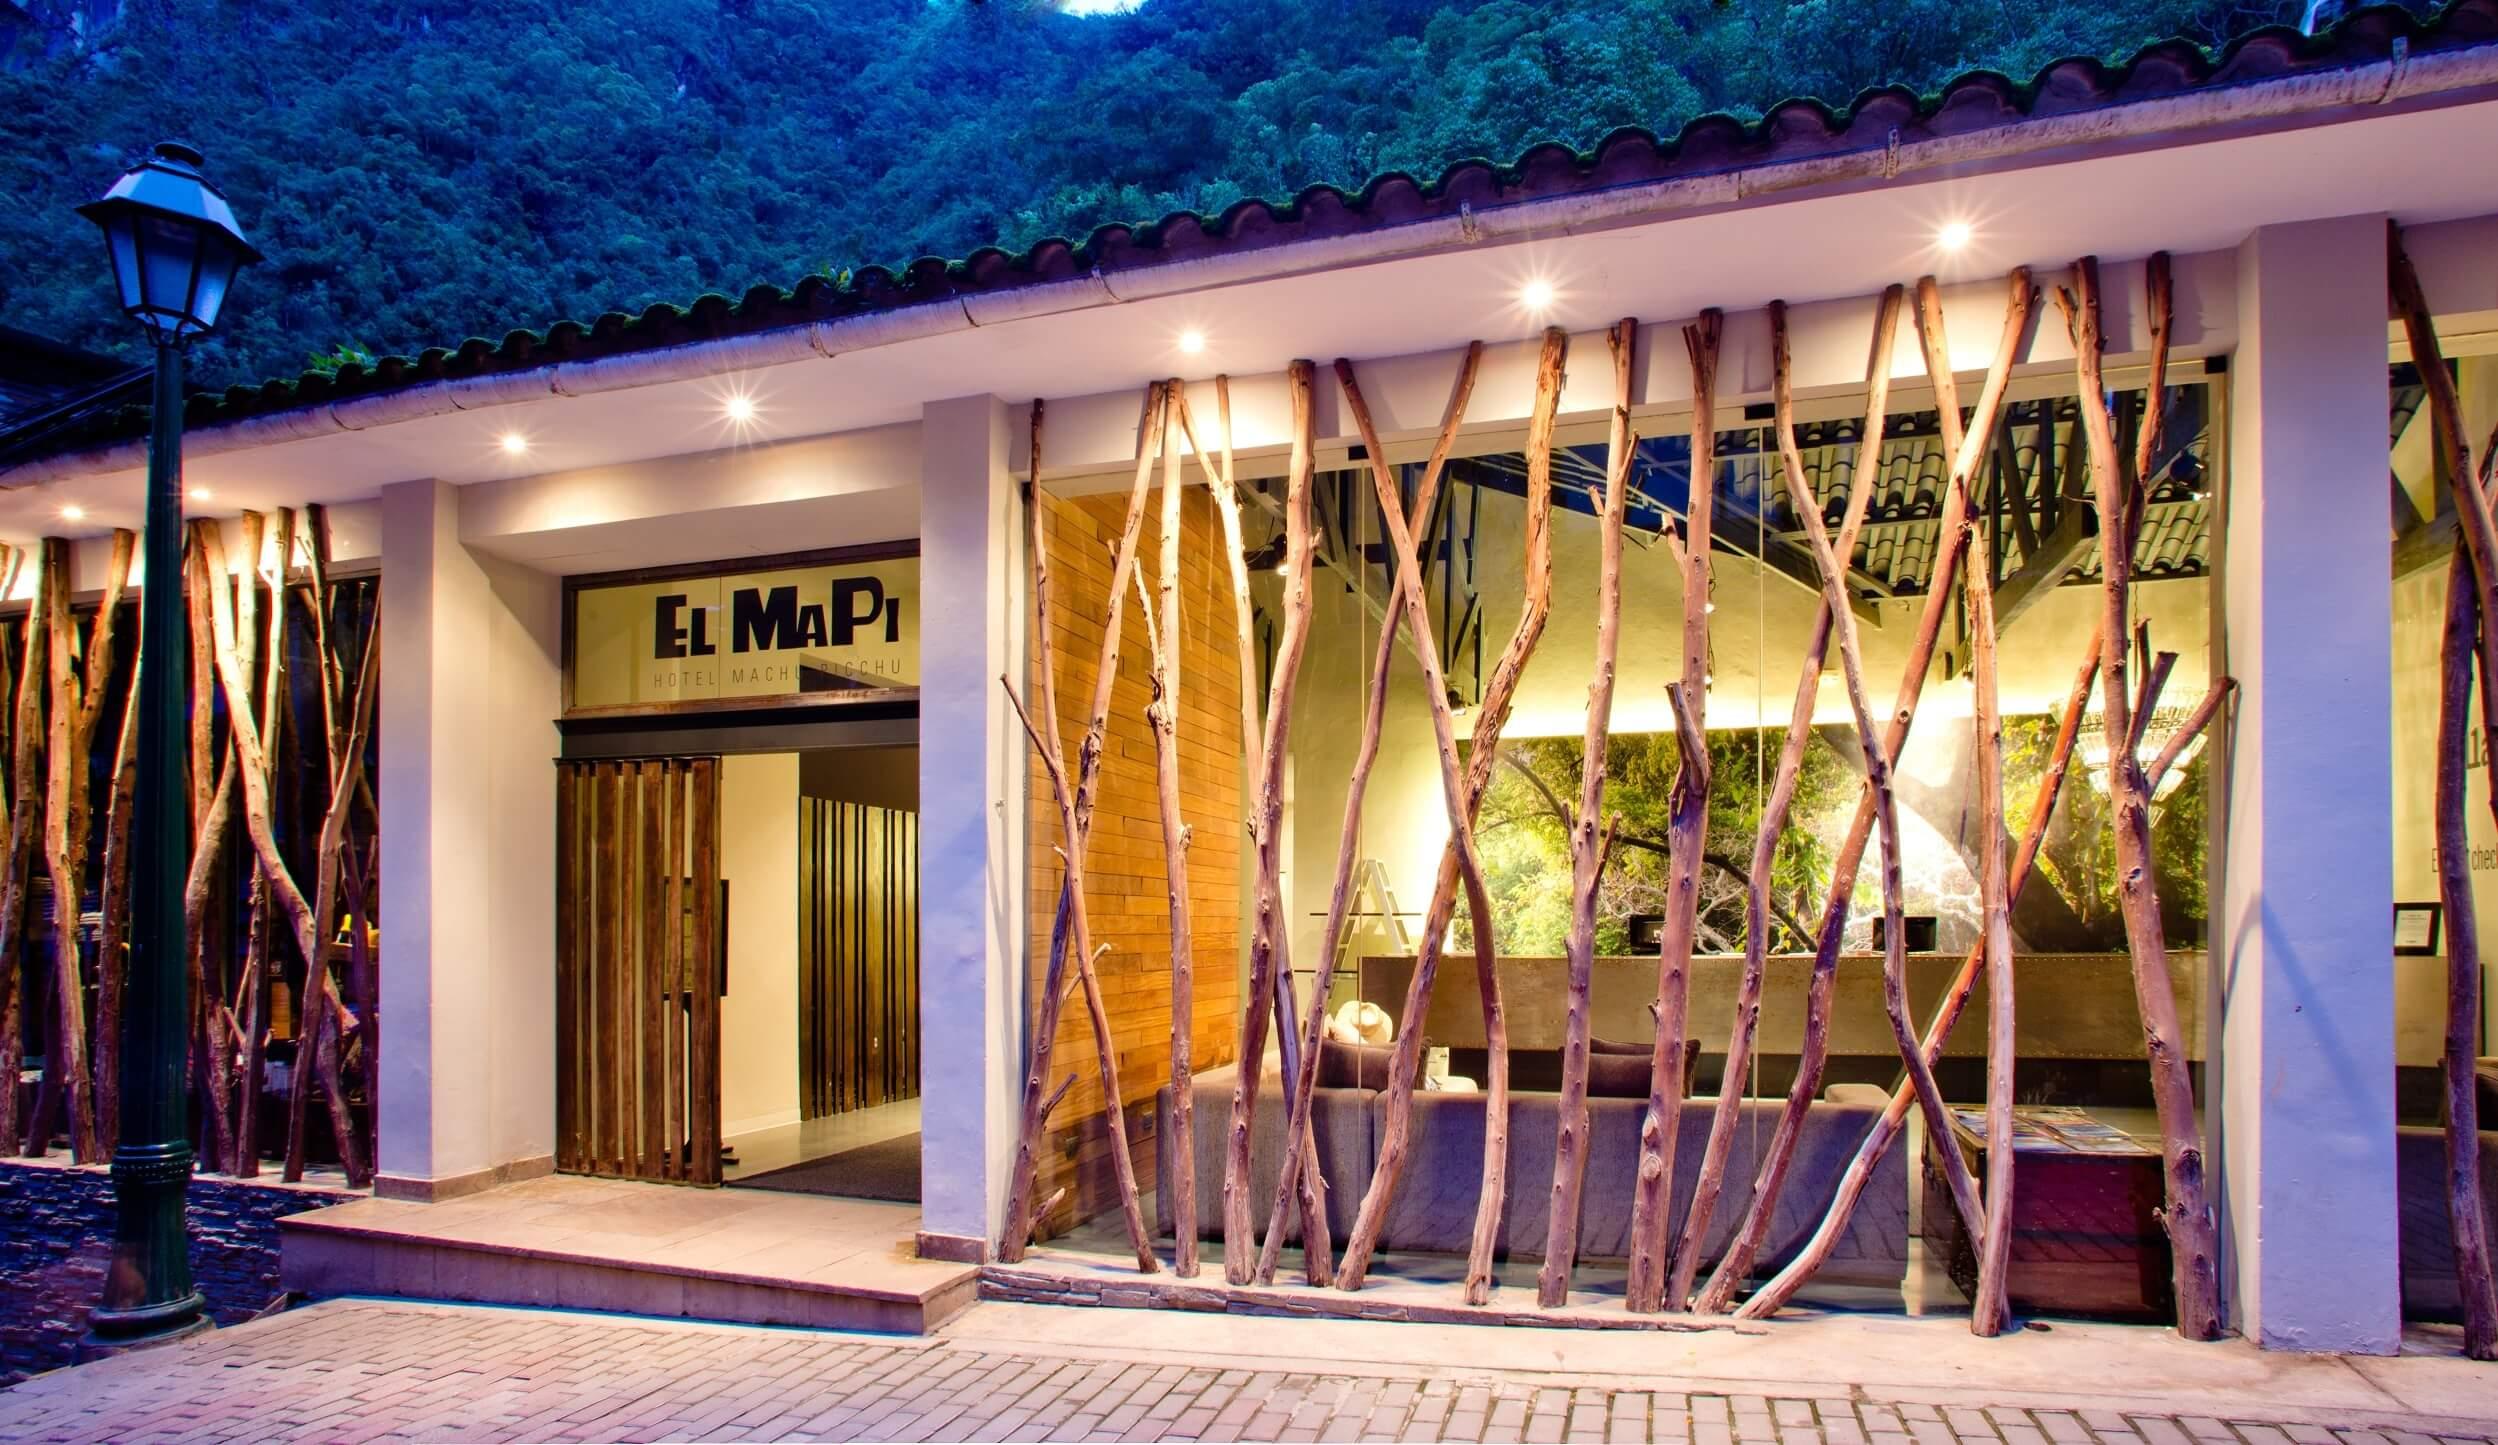 Hotel El MaPi Machu Picchu by Inkaterra